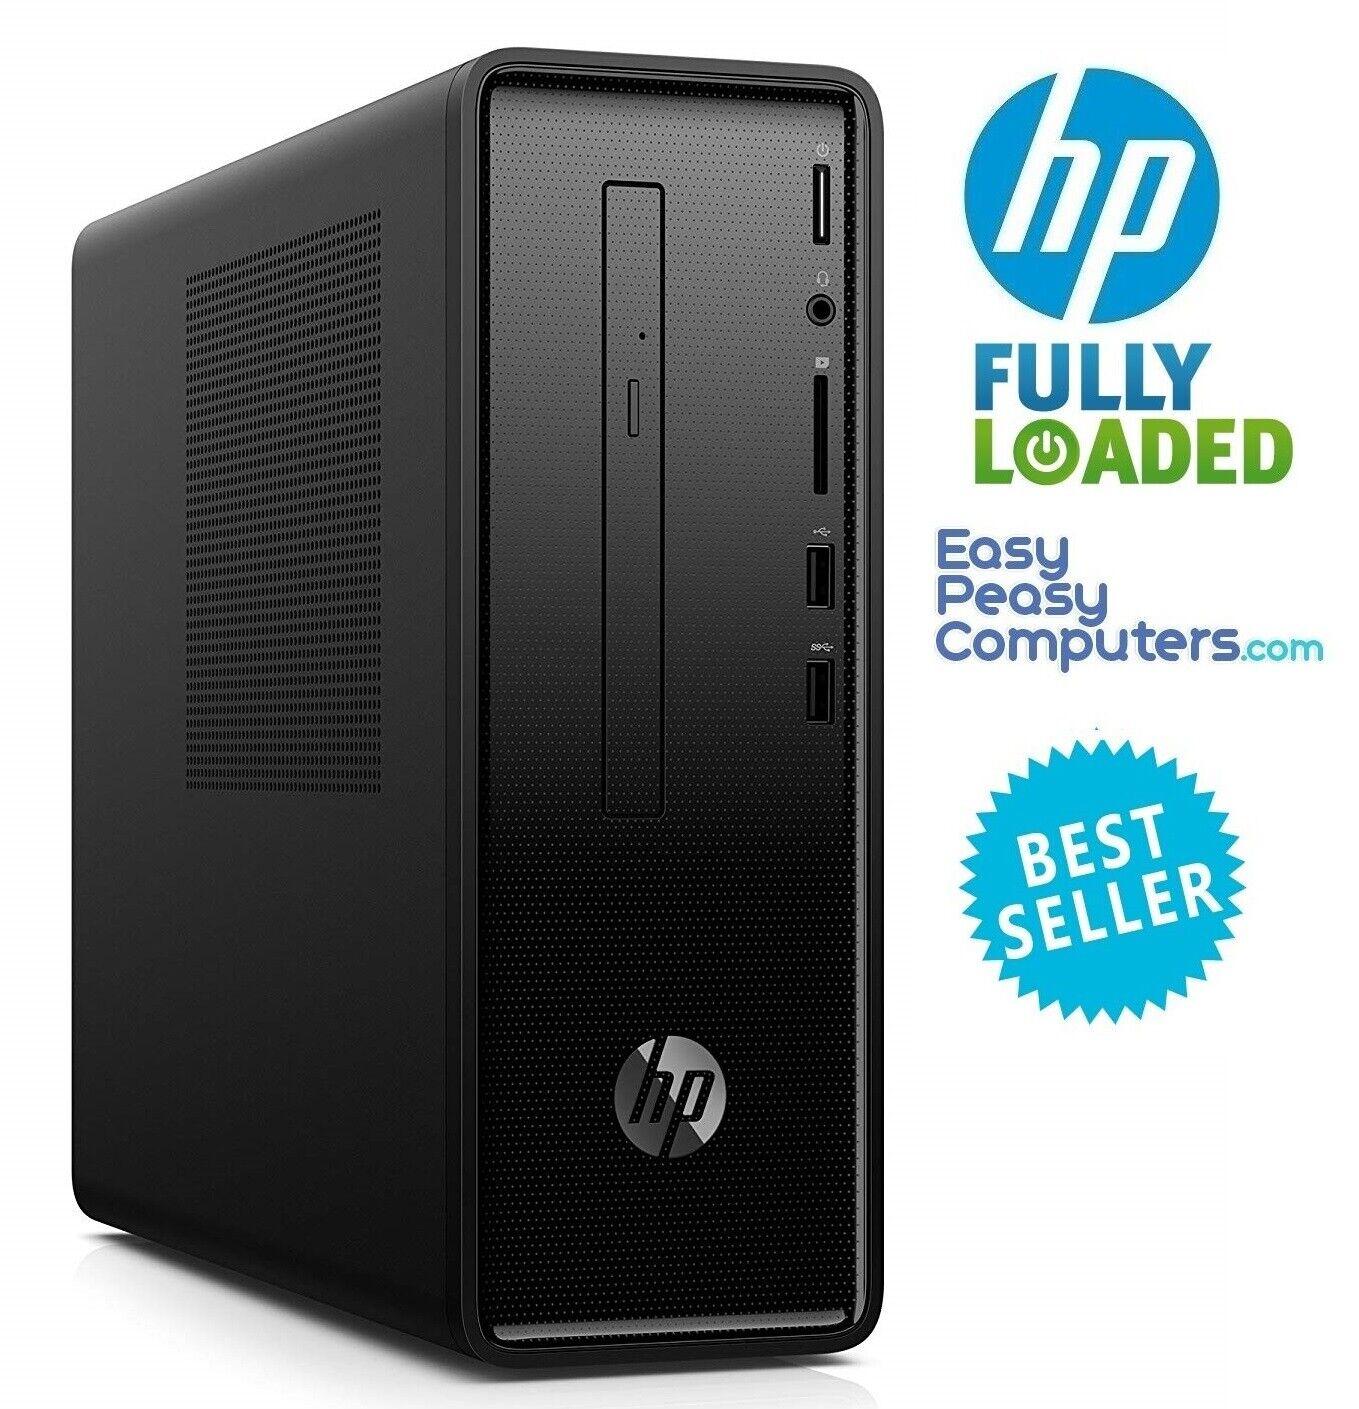 HP Desktop Computer Windows 10 8GB 1TB Bluetooth WiFi DVD+RW